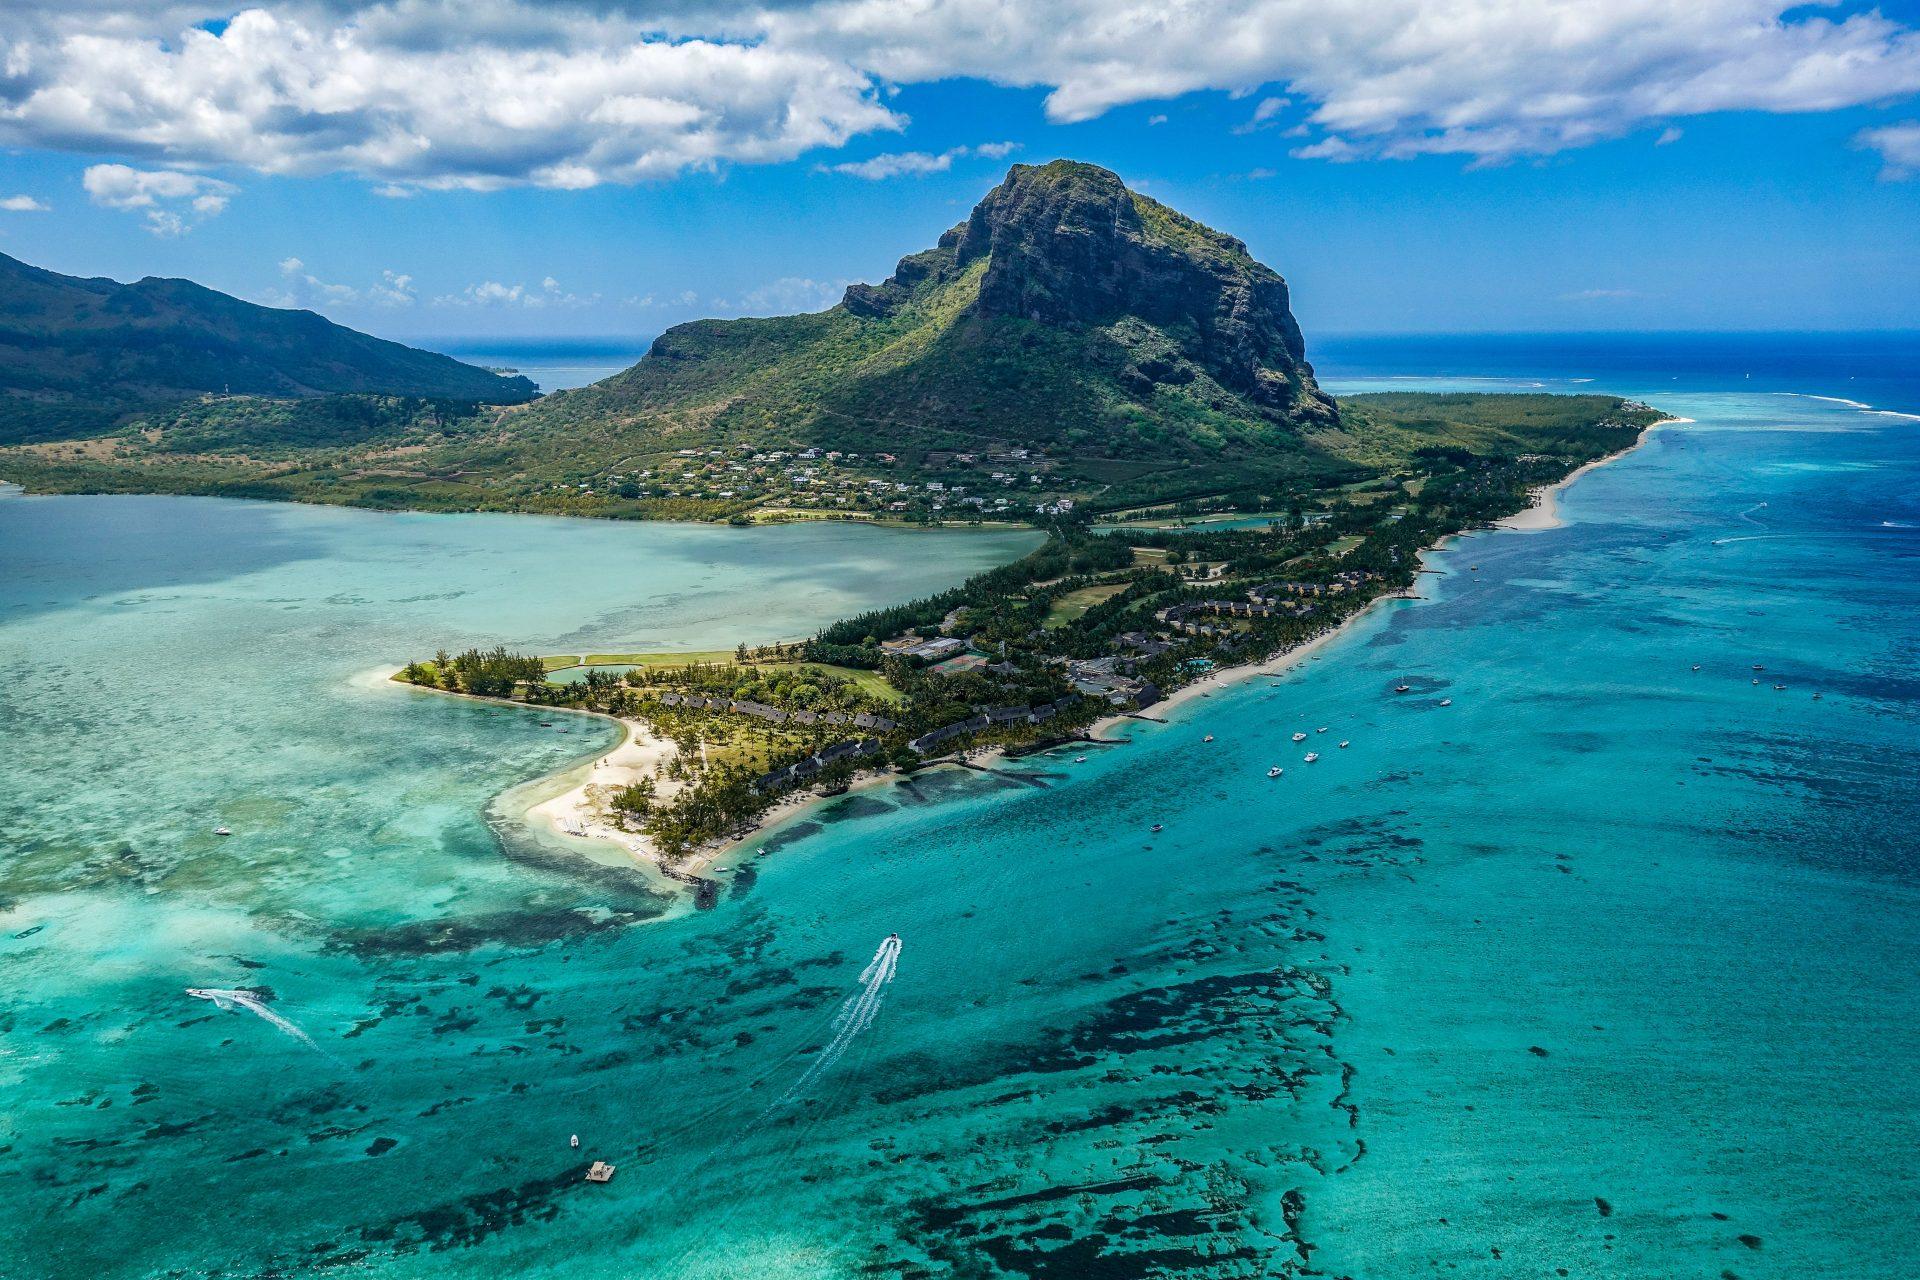 Mauritian oil spill: Environmental & Economic consequences